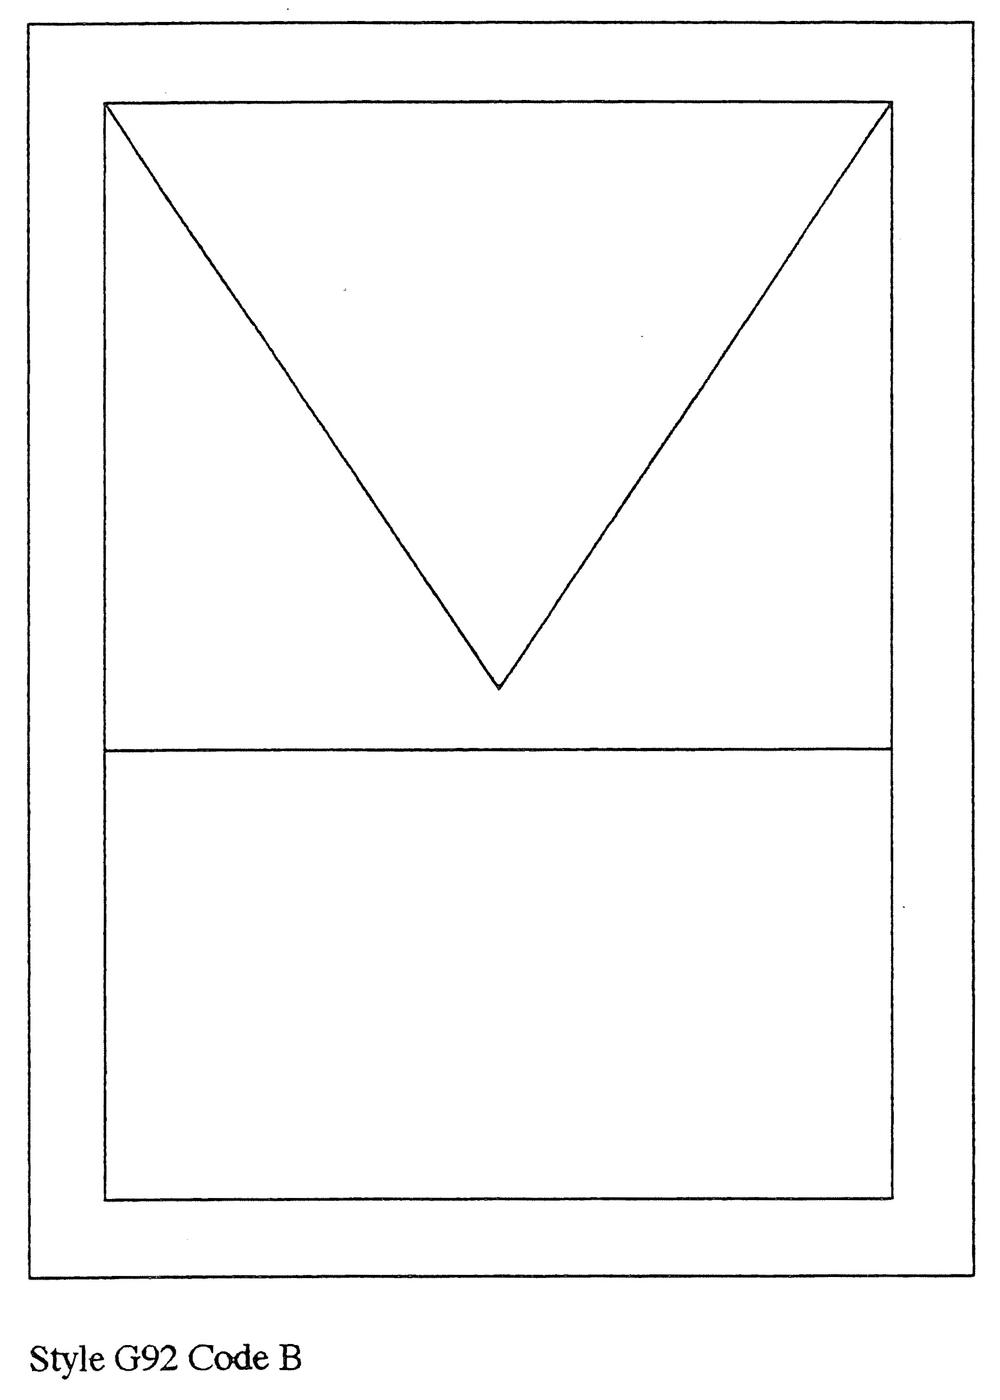 Page 7 copy 2.jpg